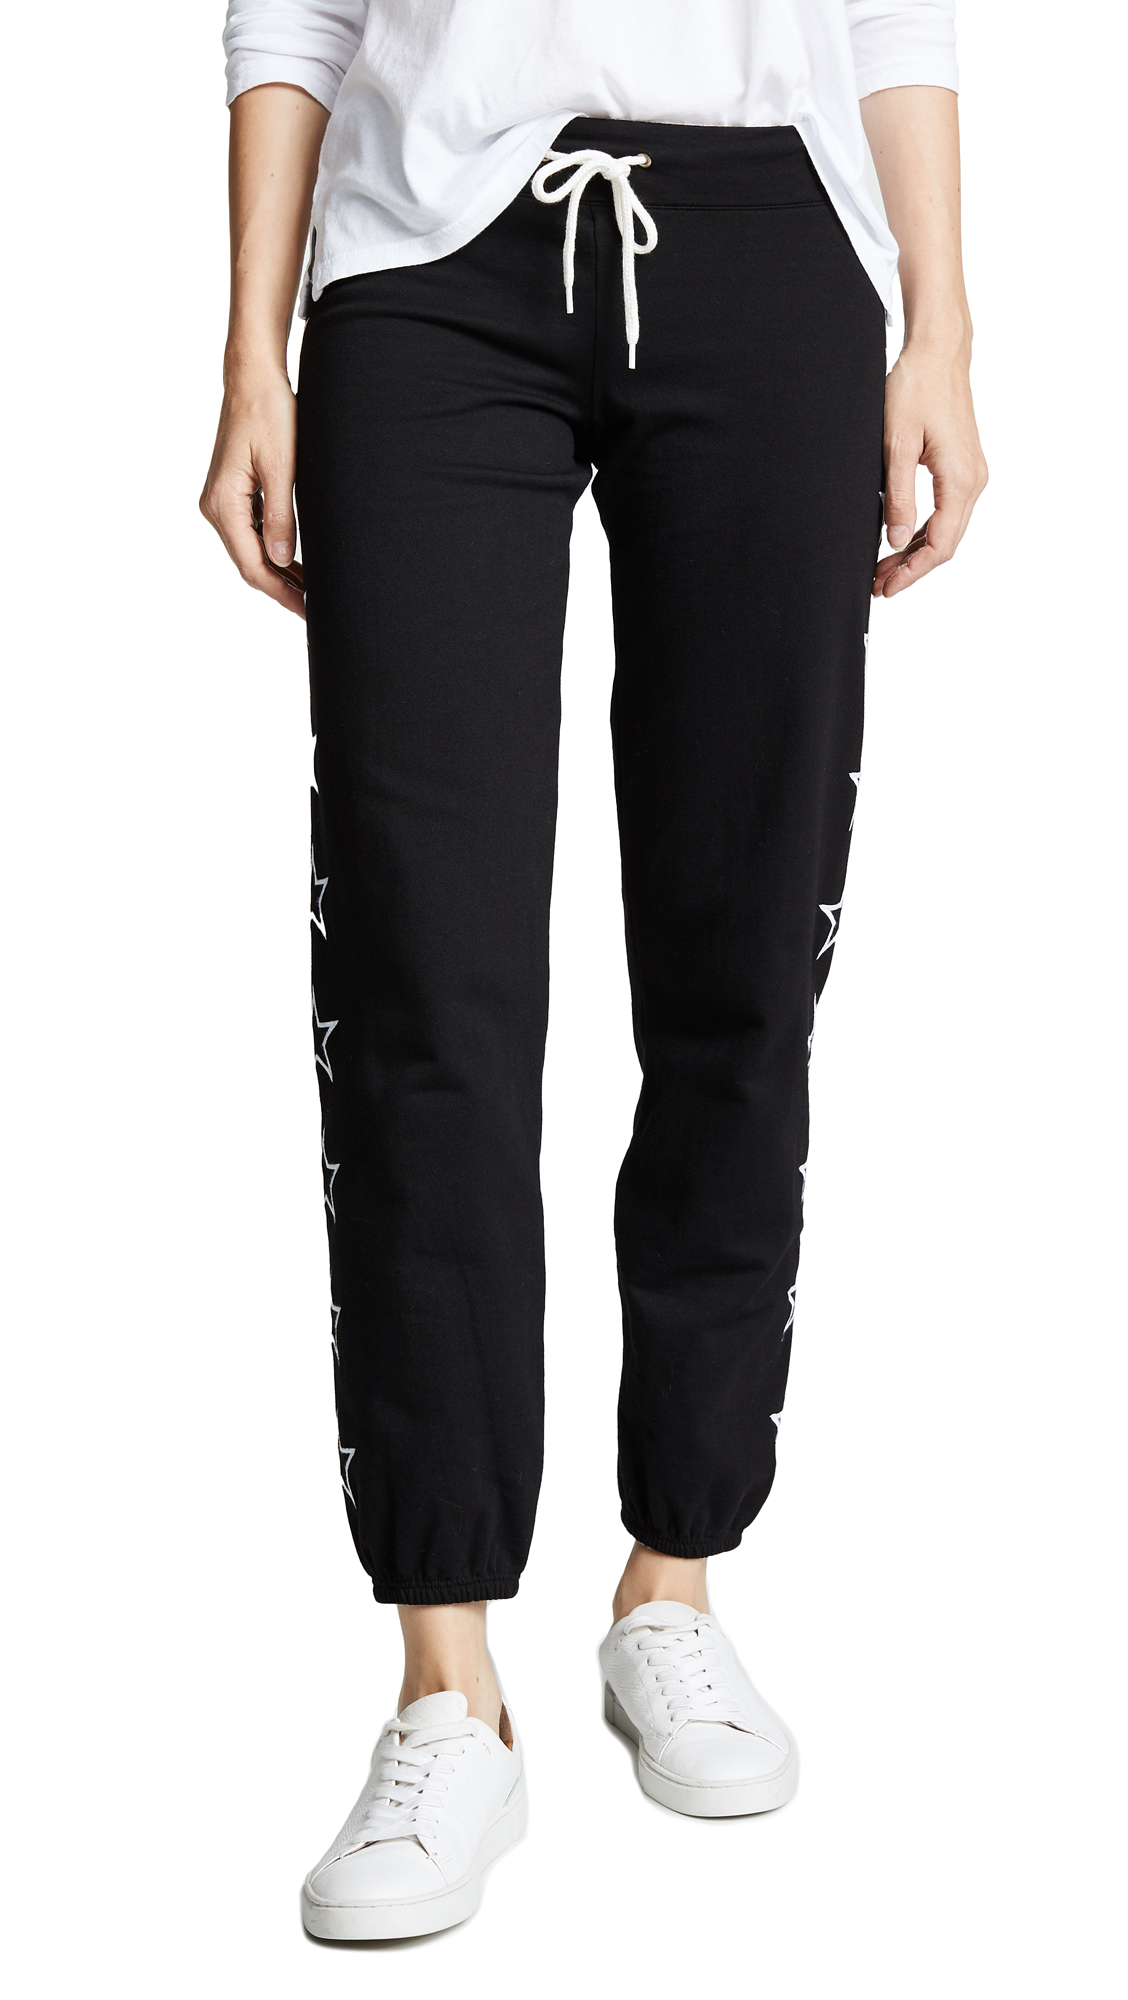 MONROW Star Sweatpants In Black